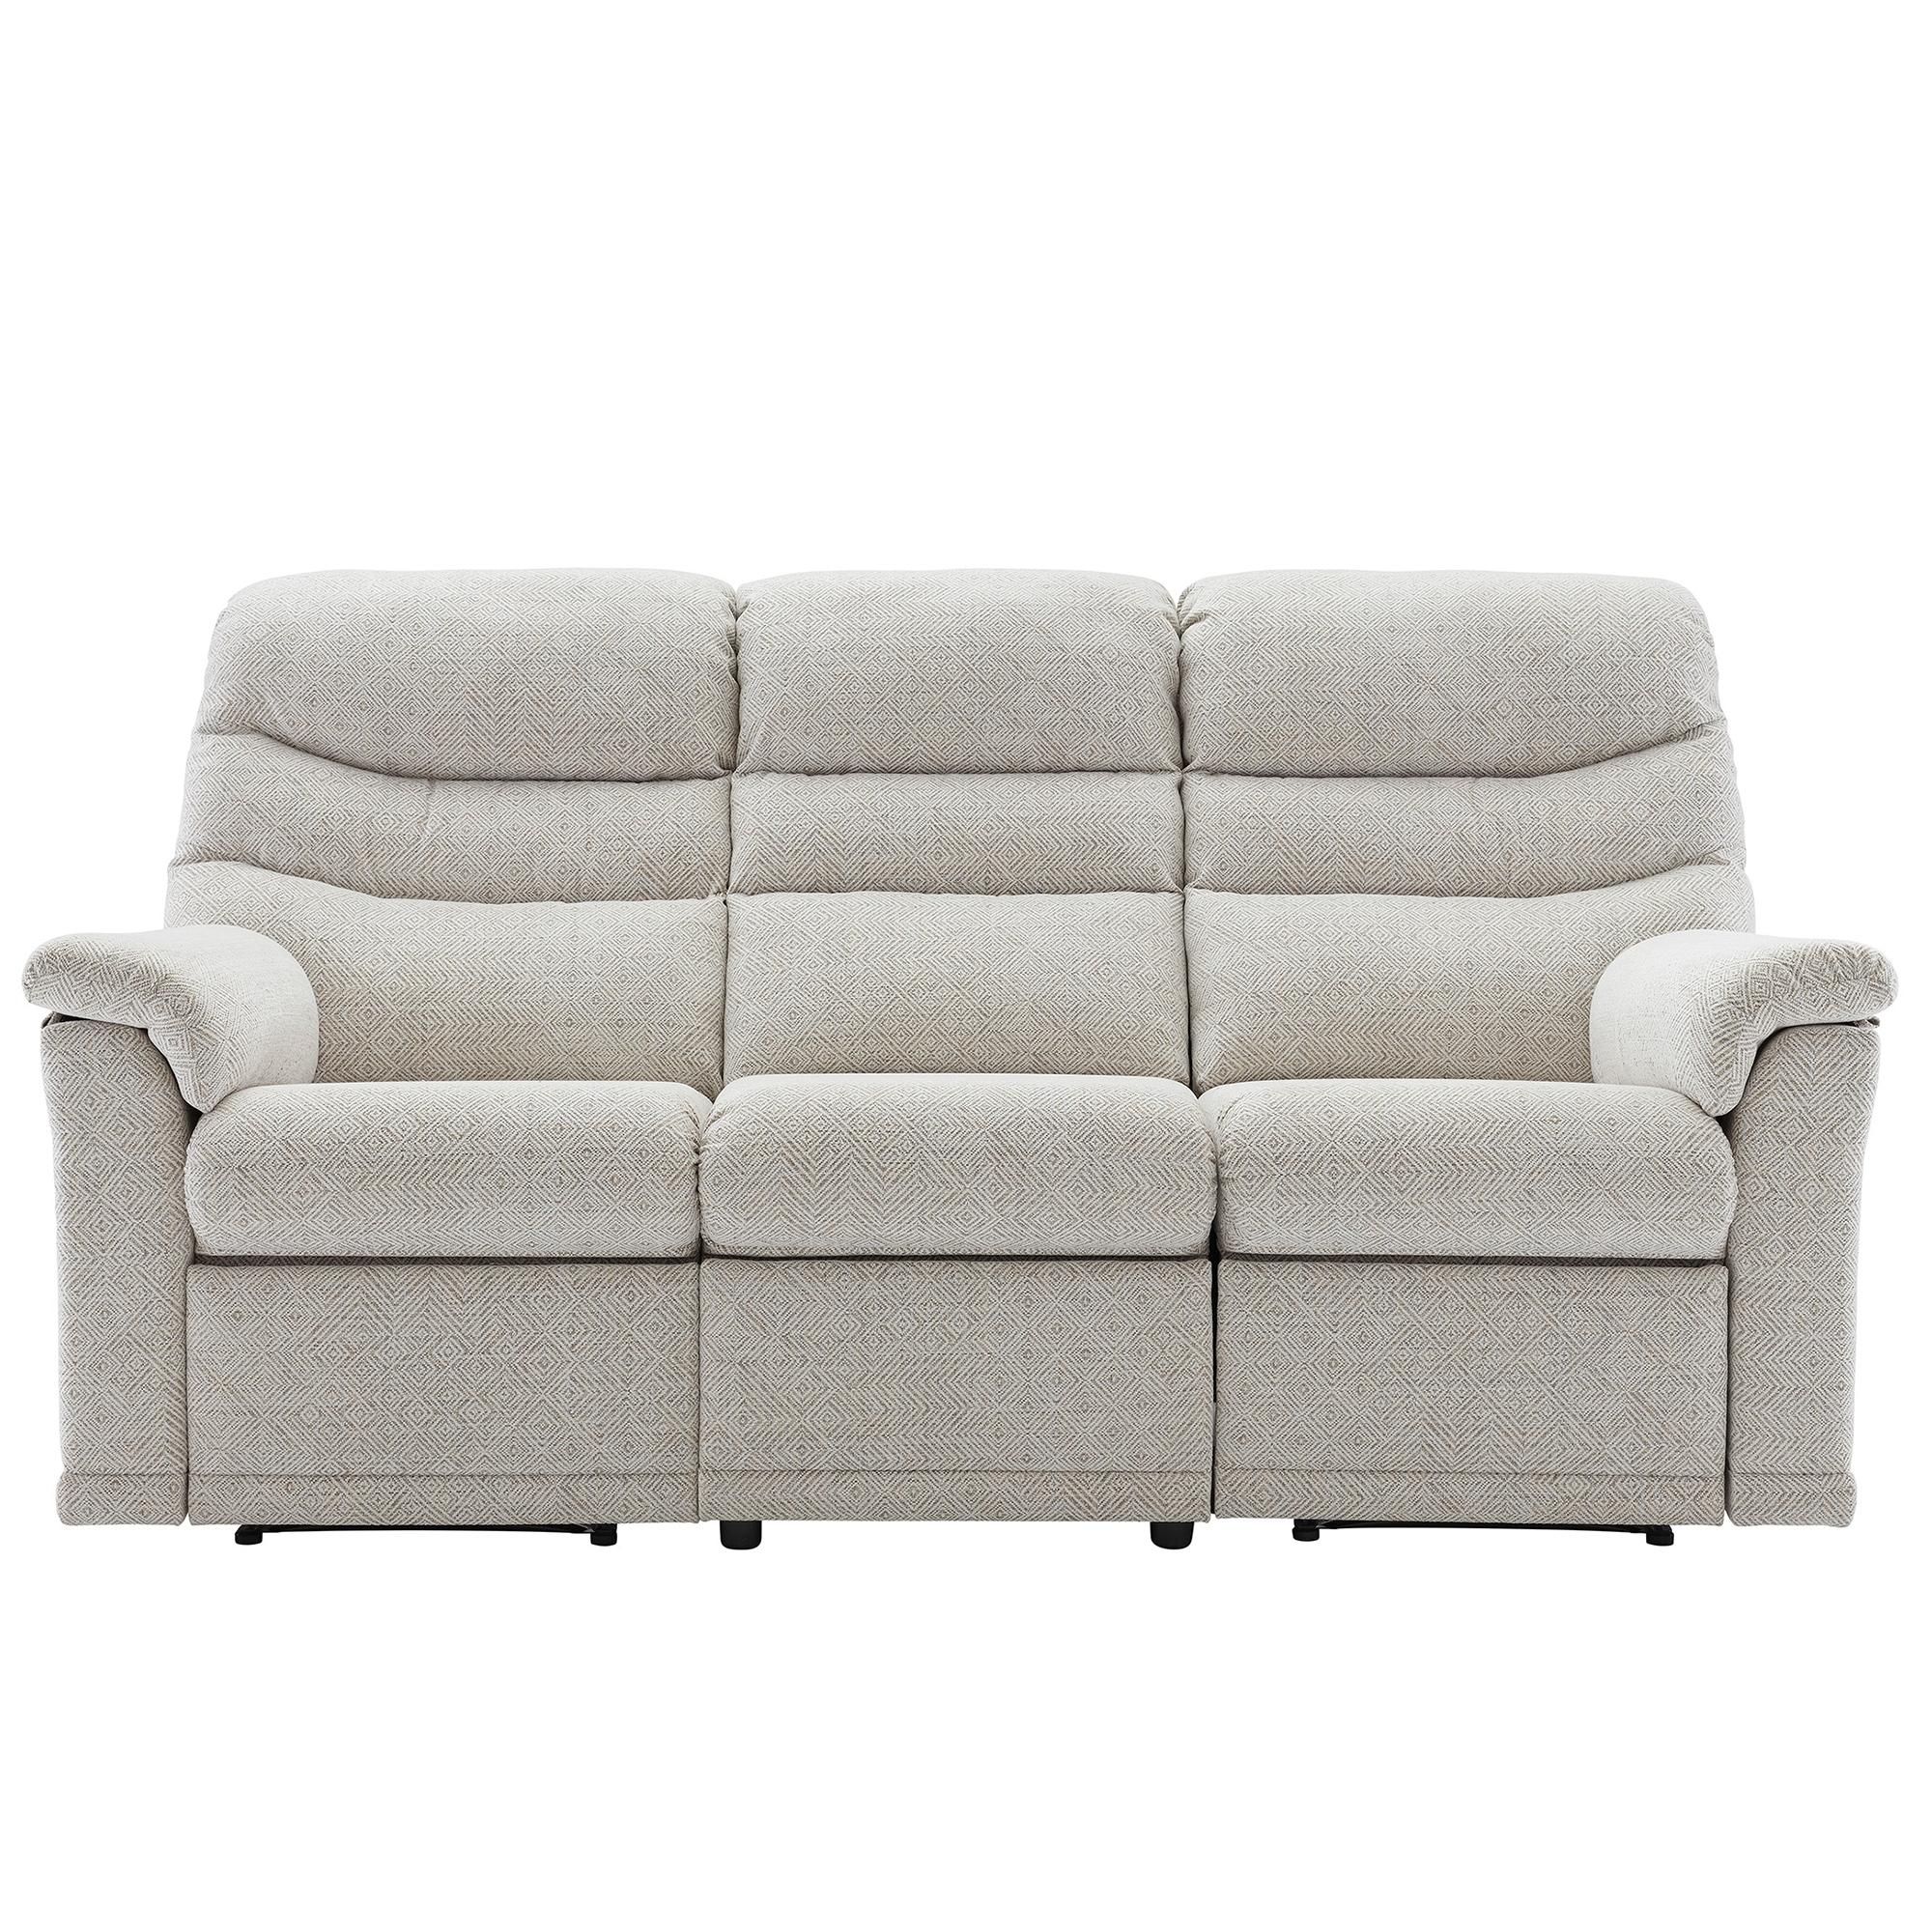 G Plan Malvern 3 Seater Double Power Recliner Sofa All Sofas